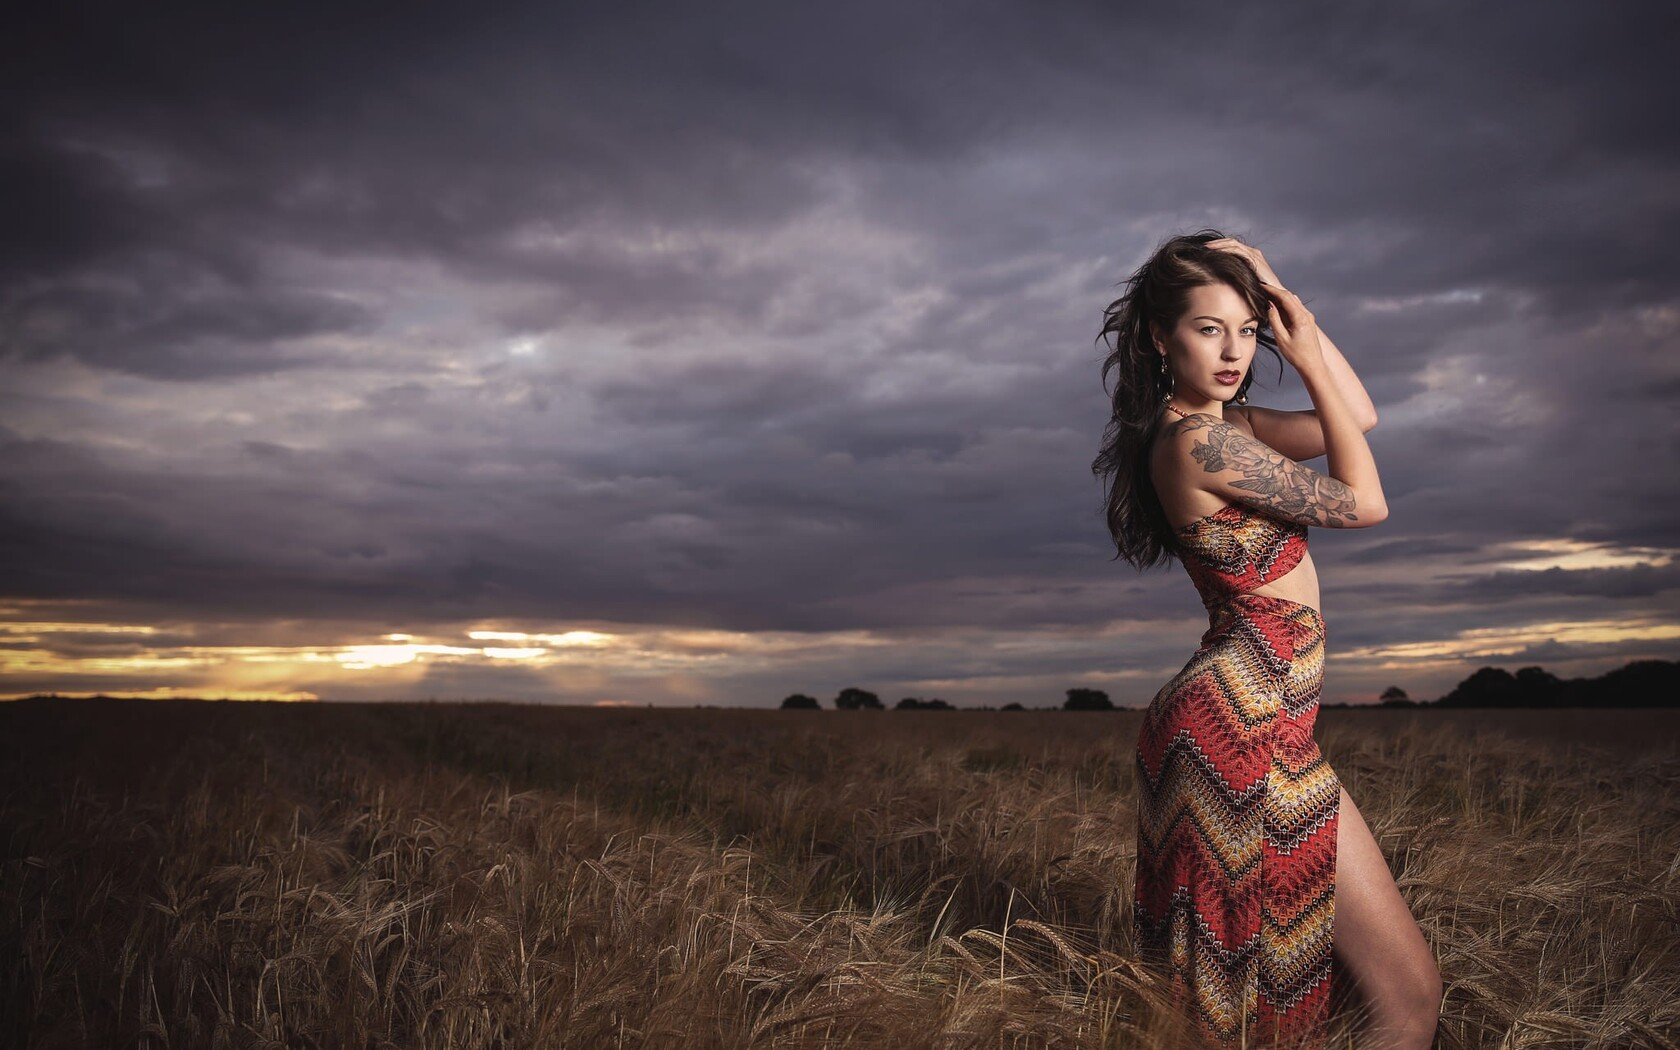 women-field-lights-photoshoot-pic.jpg